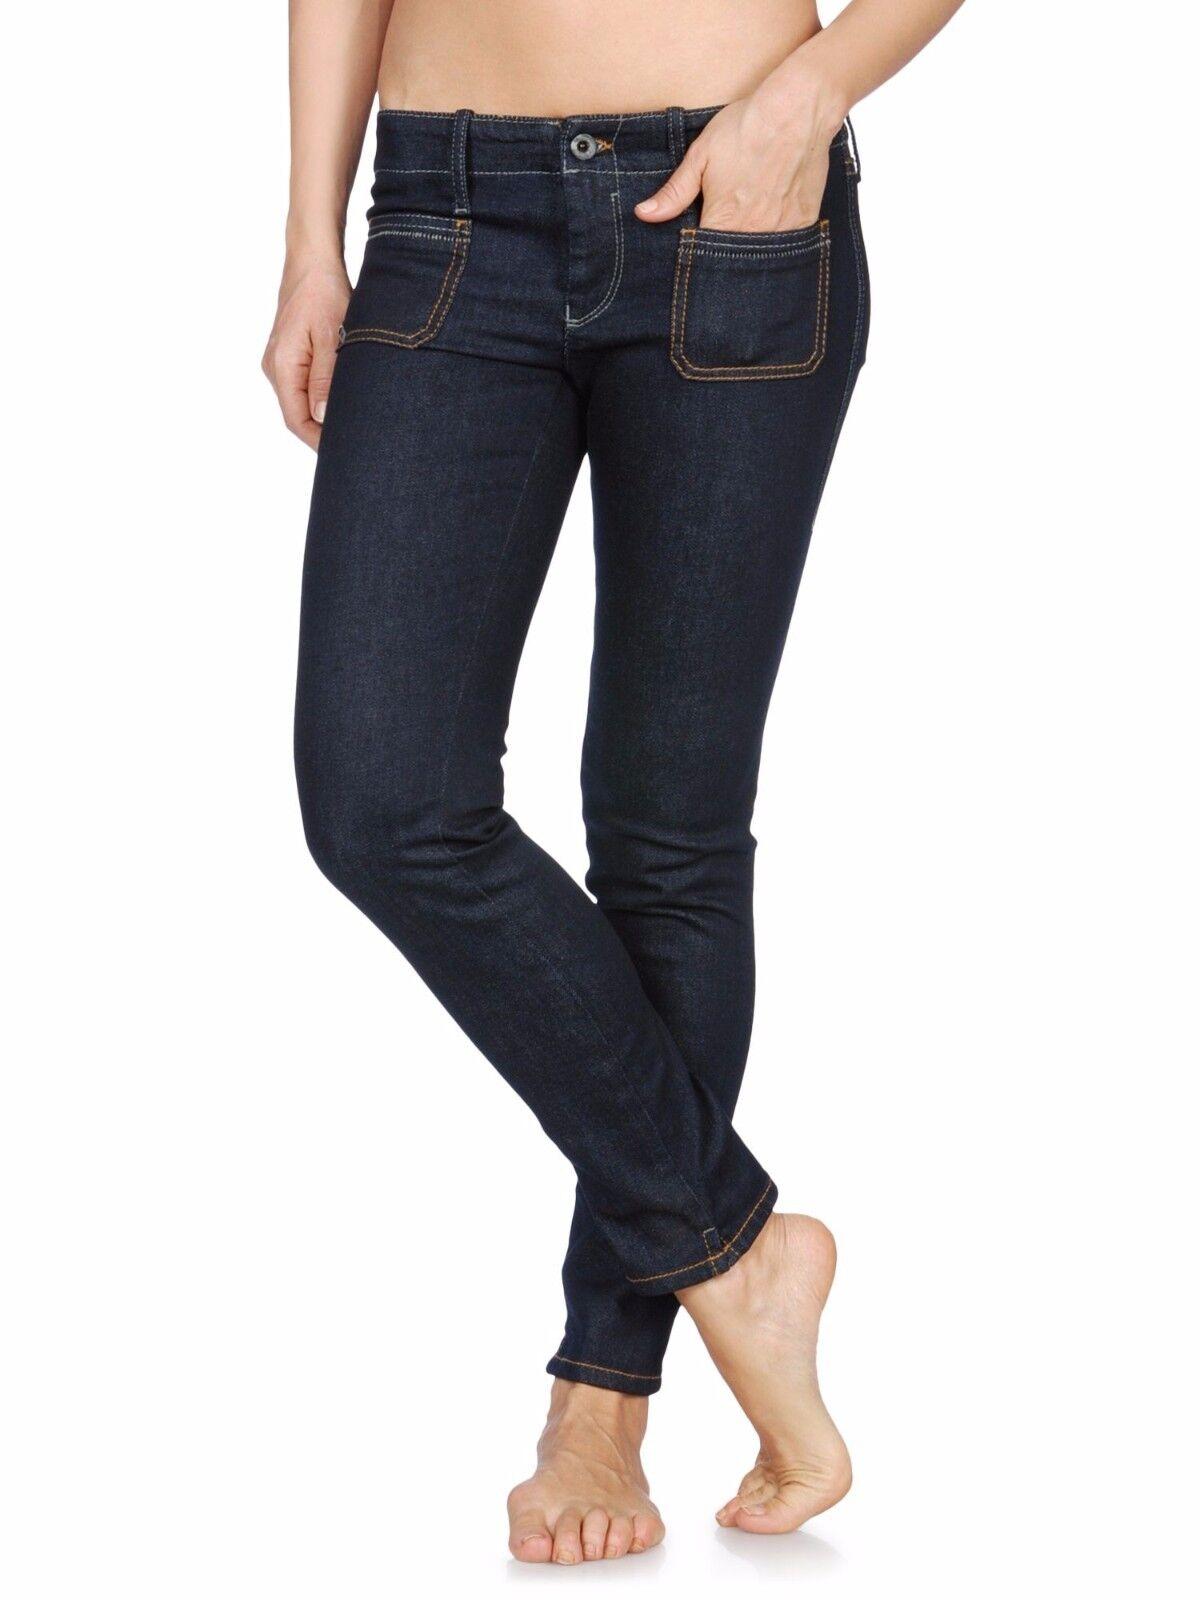 Diesel + Edun Ed Paty Ankle Stretch Cotton Jeans Pants Trousers Denim 30  228